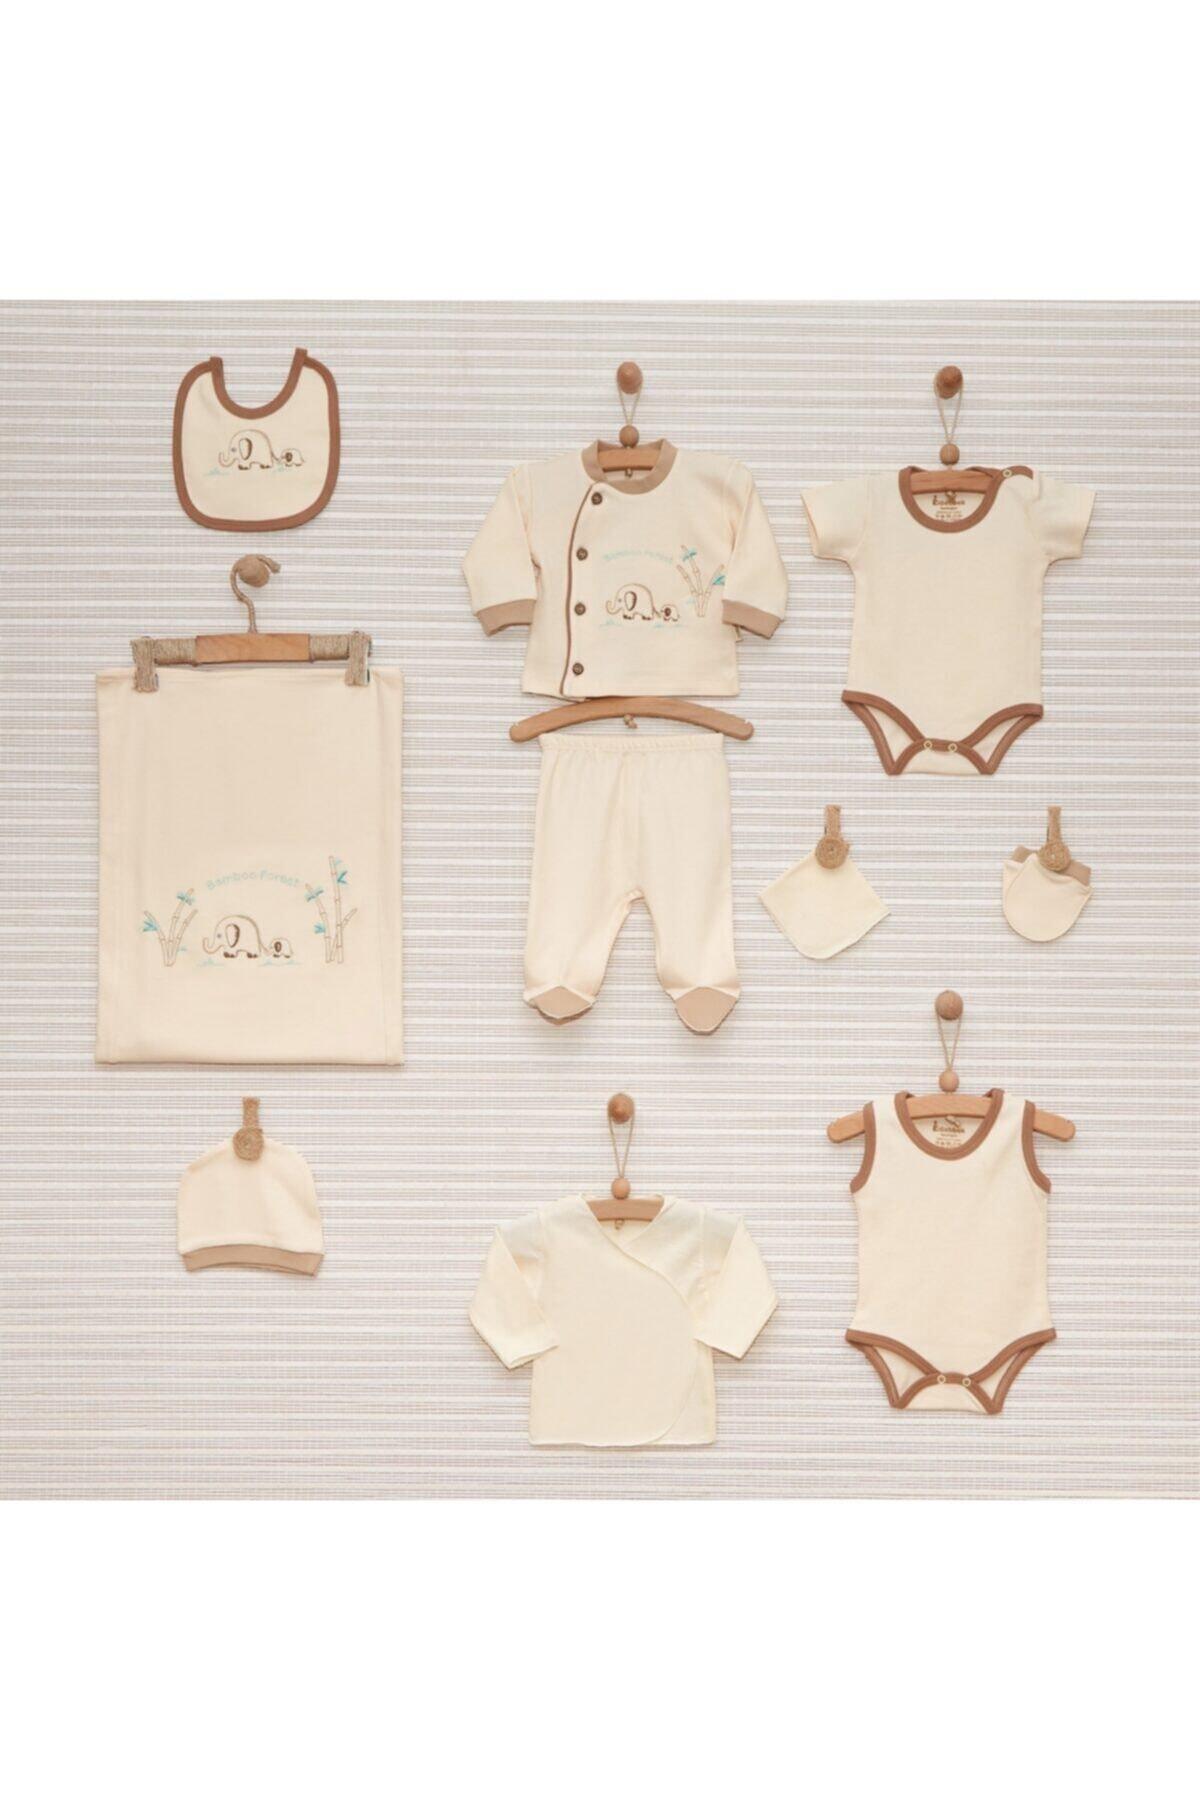 Nenny Baby Anne Fil Erkek Bebek %100 Pamuk Organik 10 Parça Hastane Çıkış Seti 1